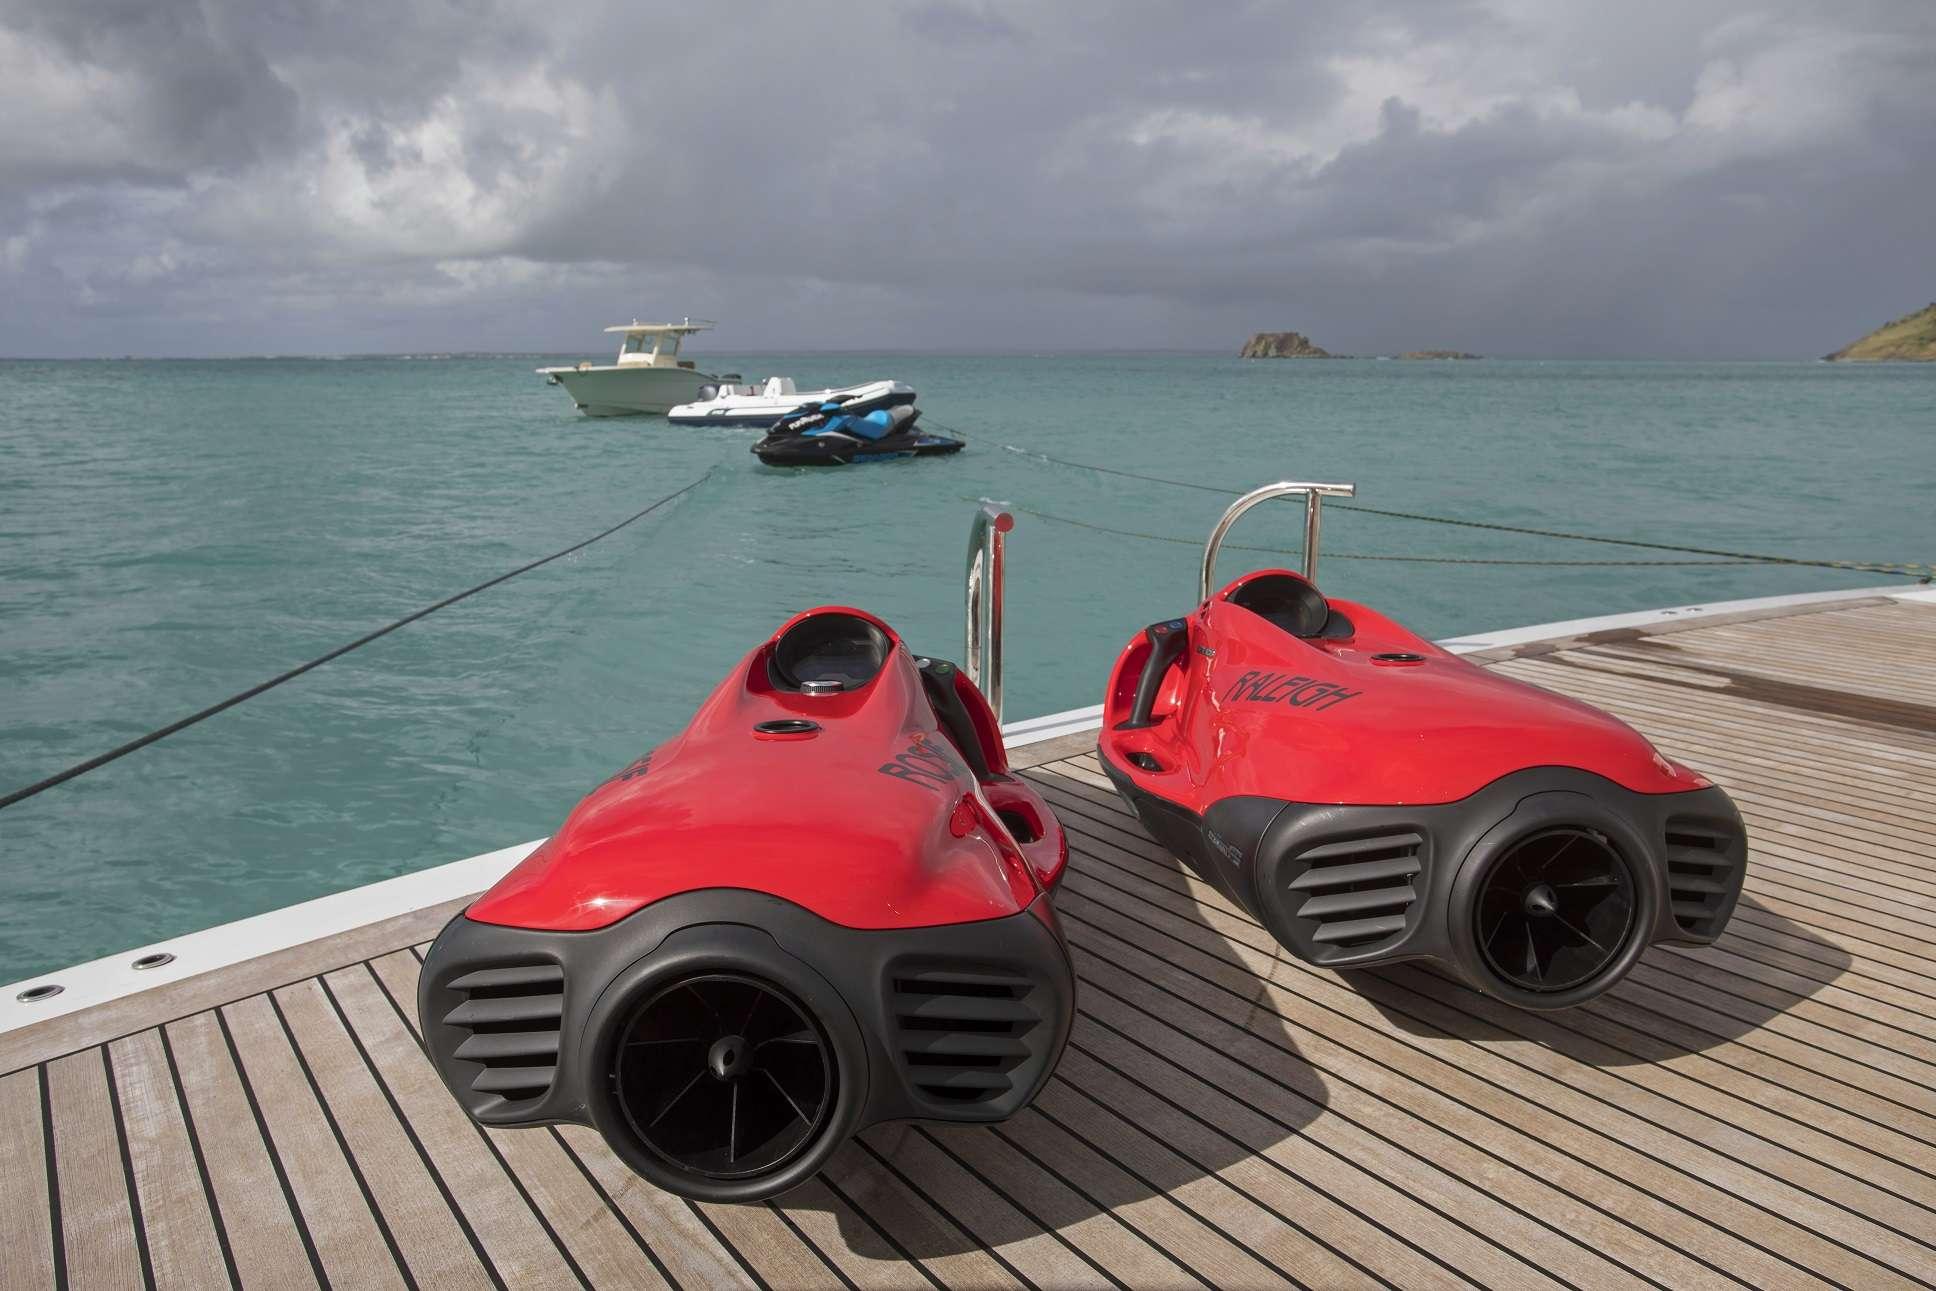 Image of Pura Vida yacht #15